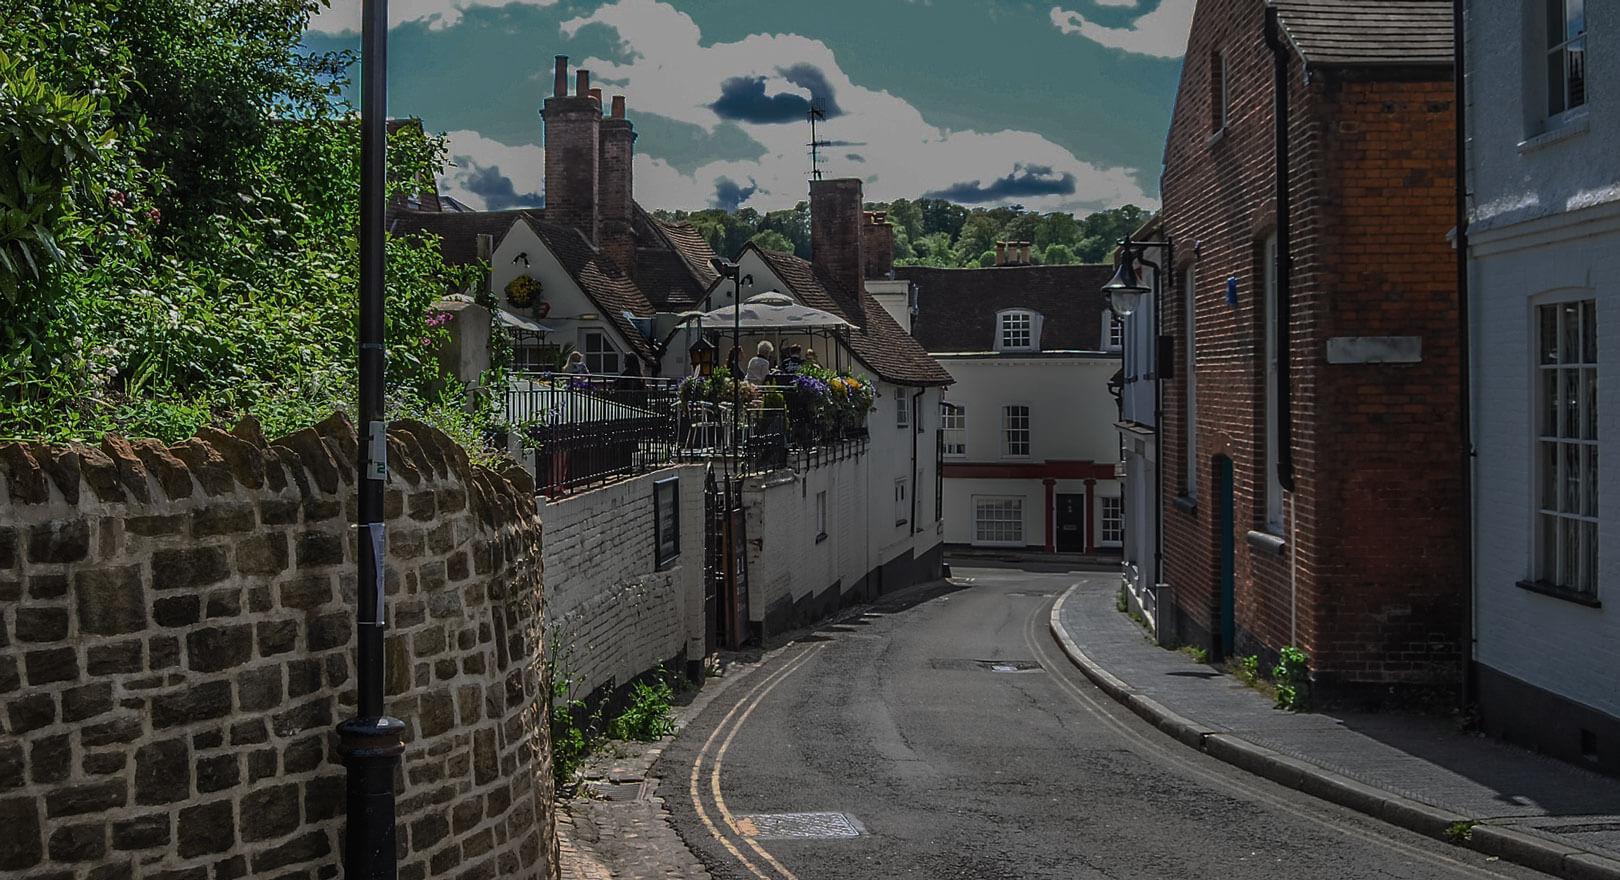 winchester-street-view.jpg